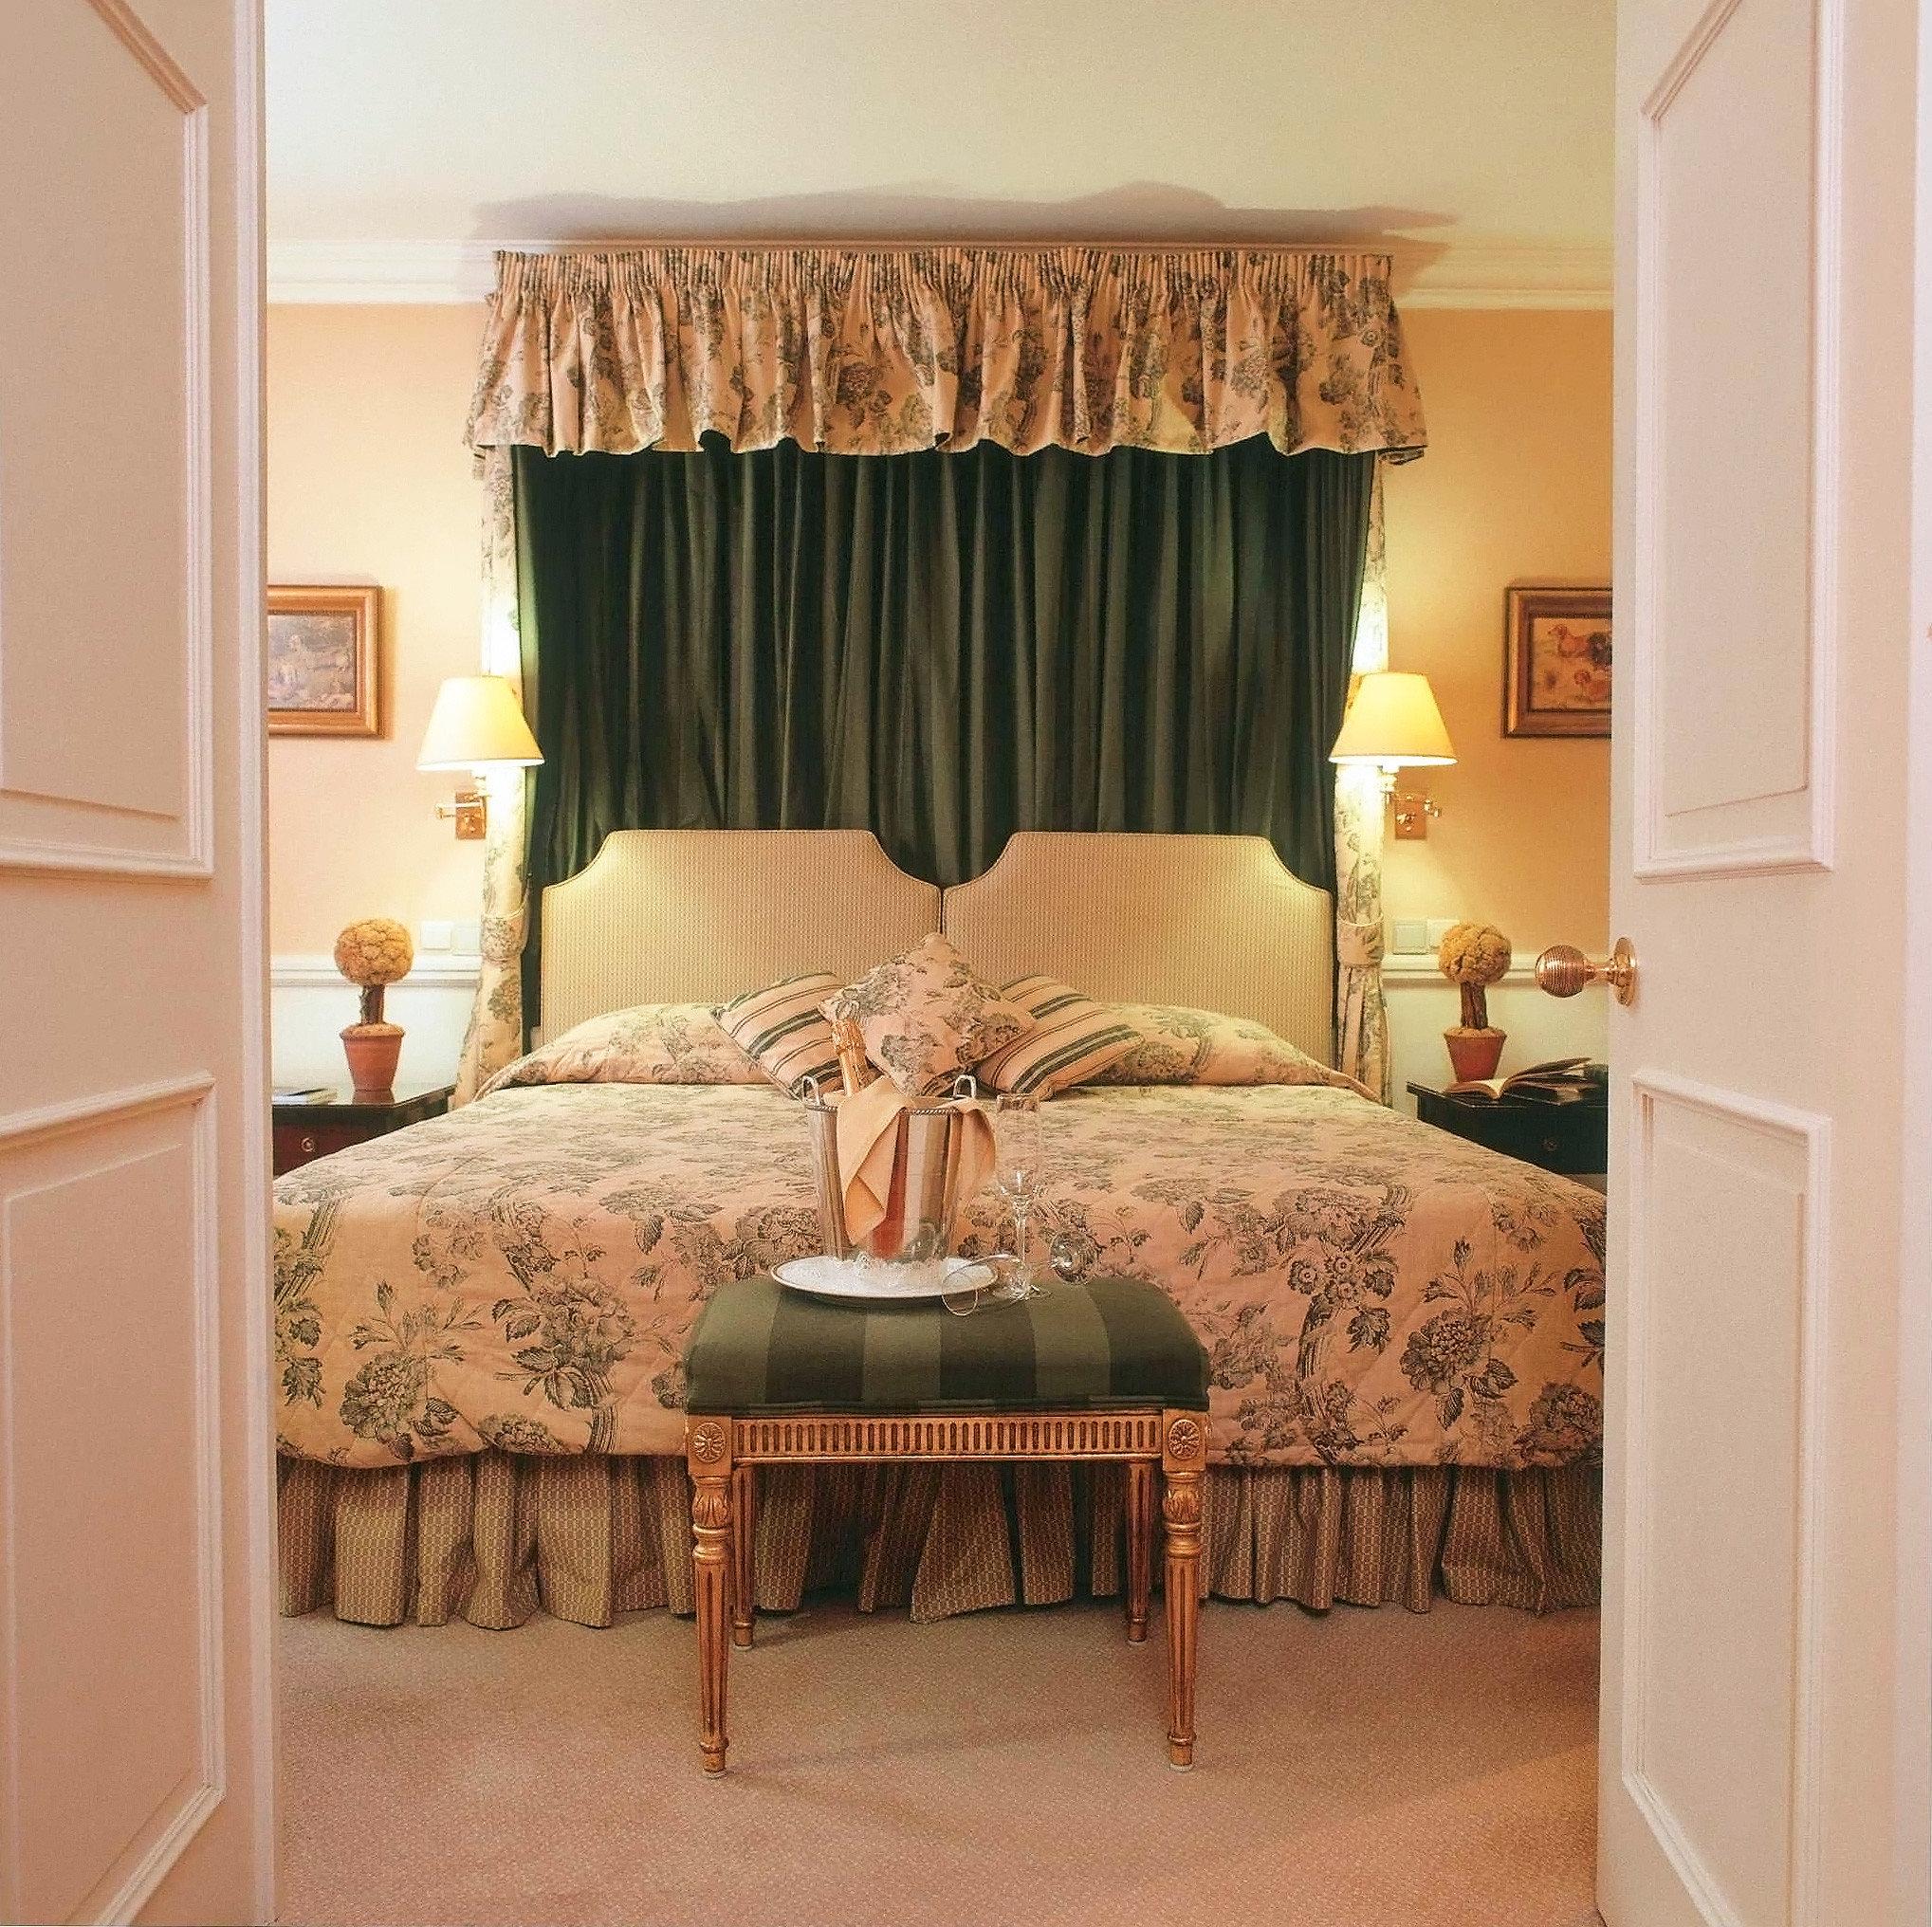 Bedroom Elegant Luxury Romantic Suite property curtain home living room textile cottage window treatment decor